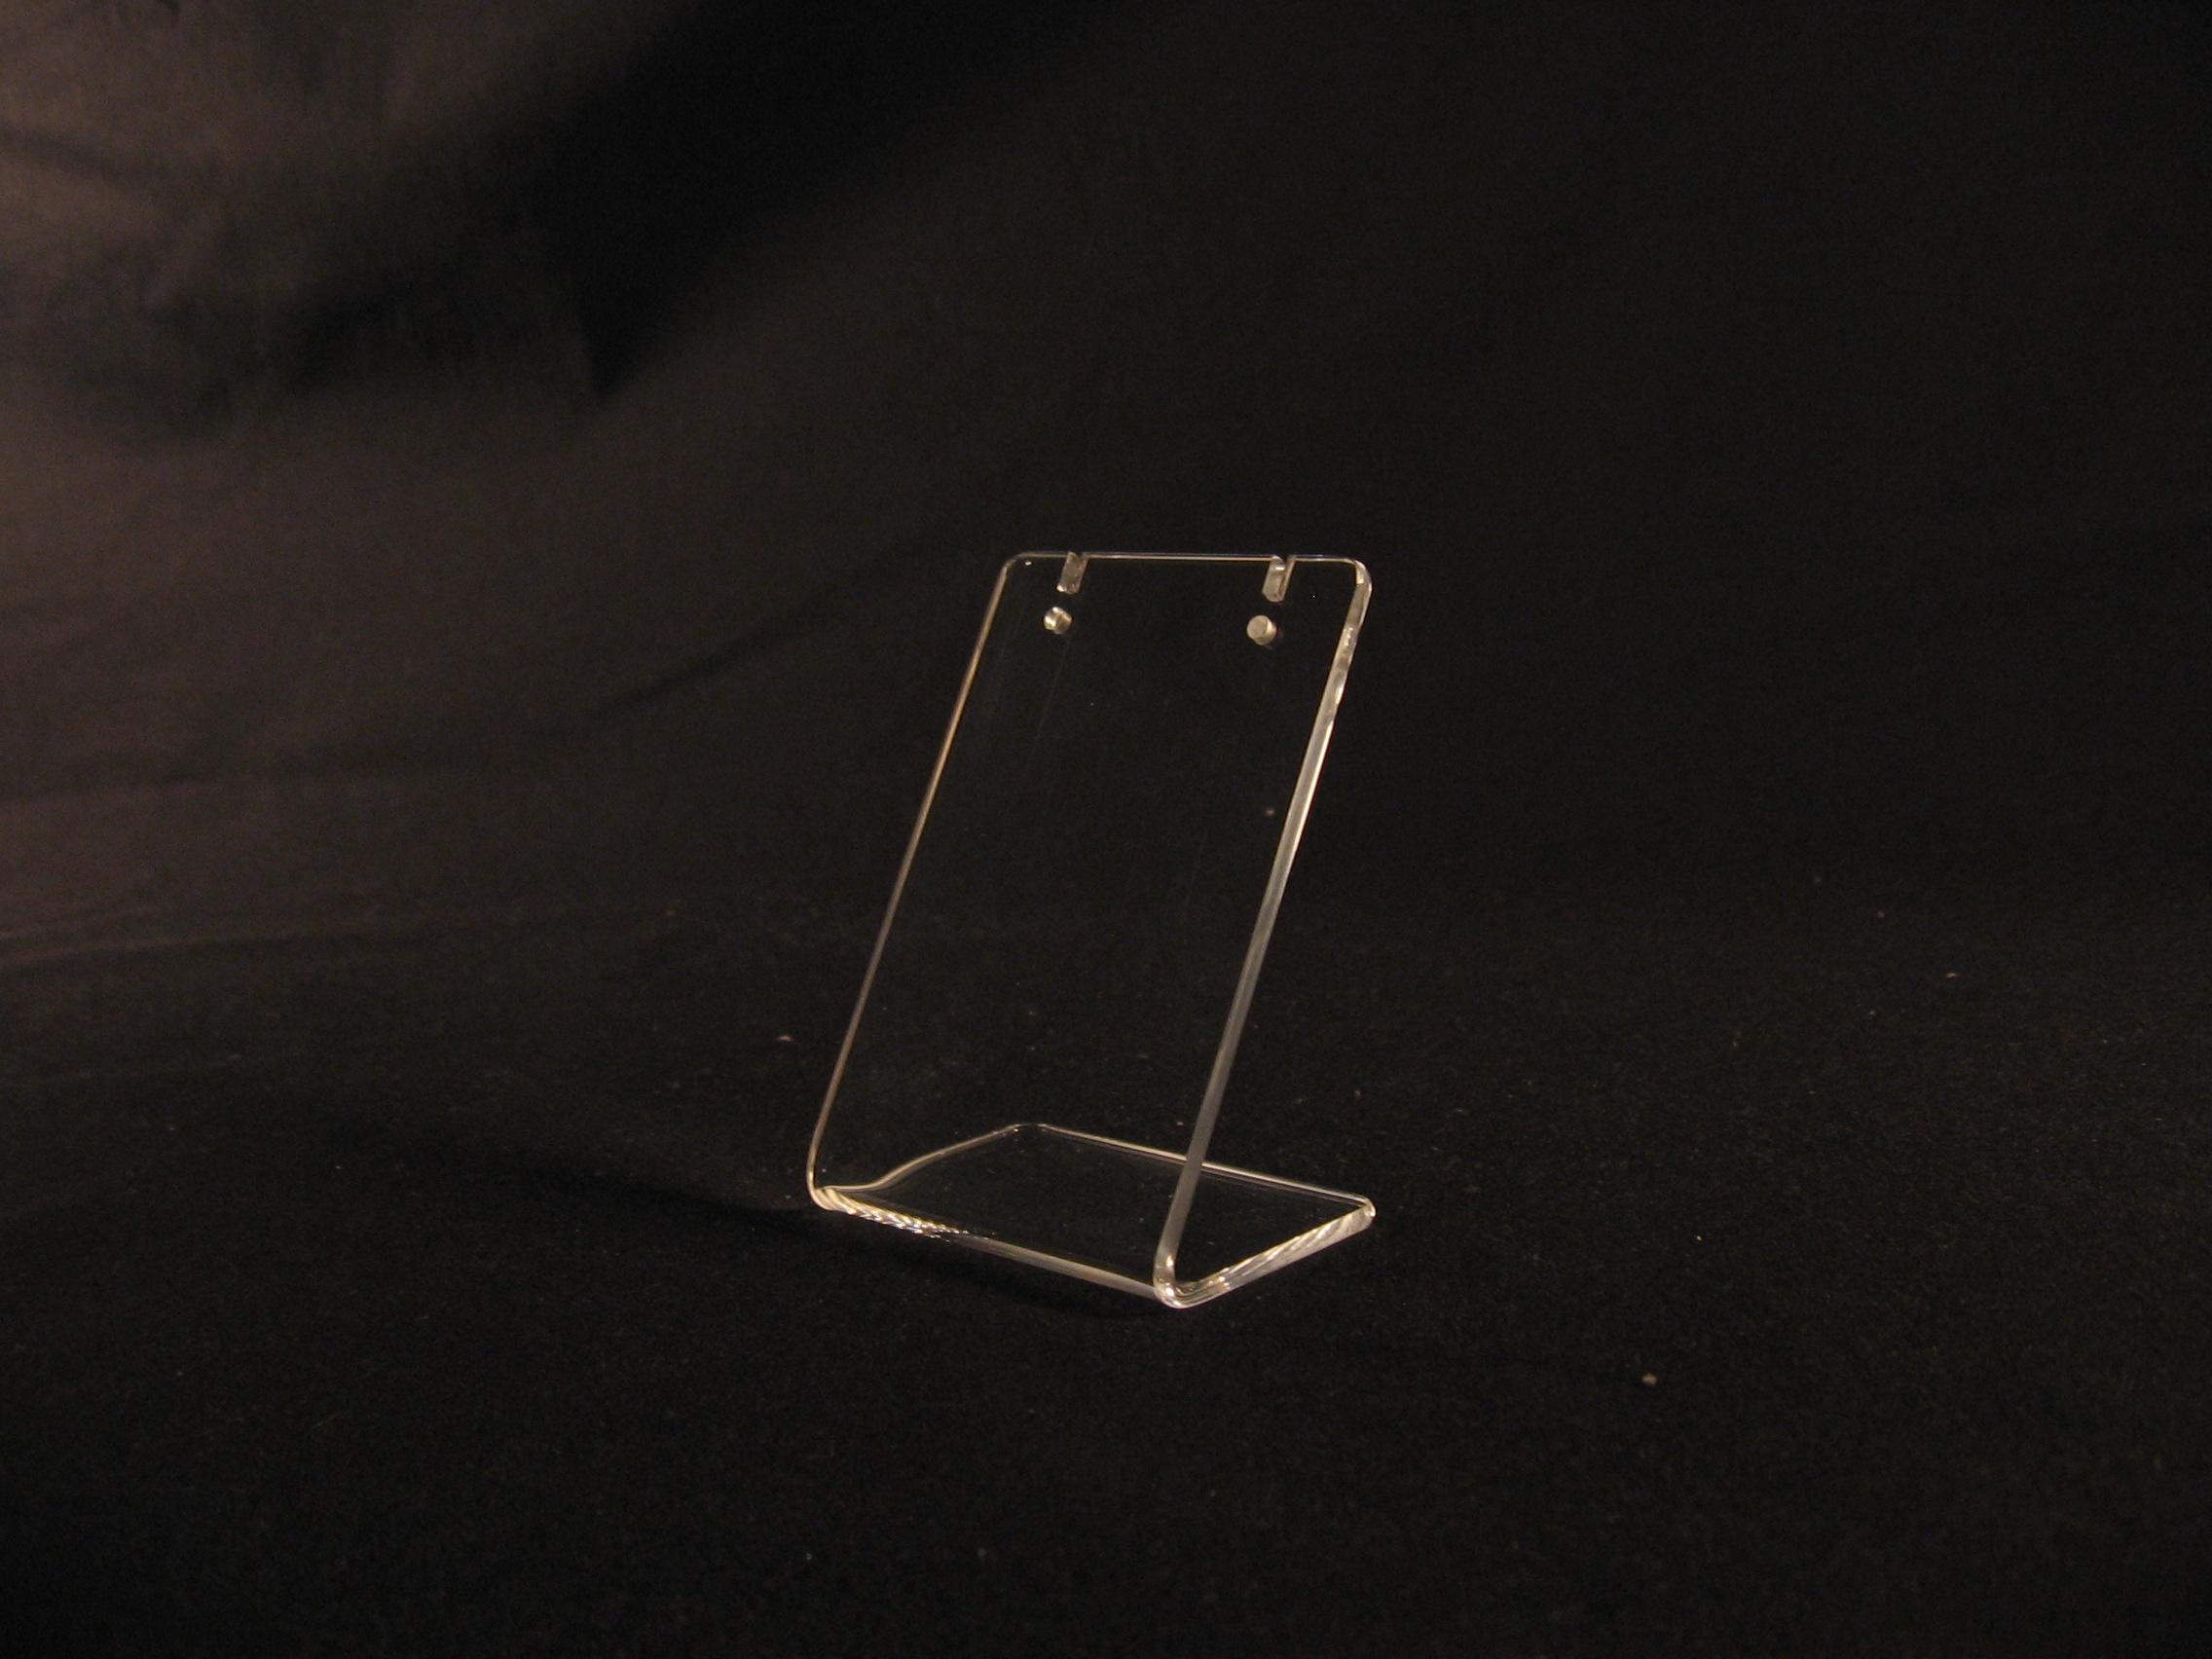 Stoni držač za nakit mindjuse pleksliglas klirit SNP2